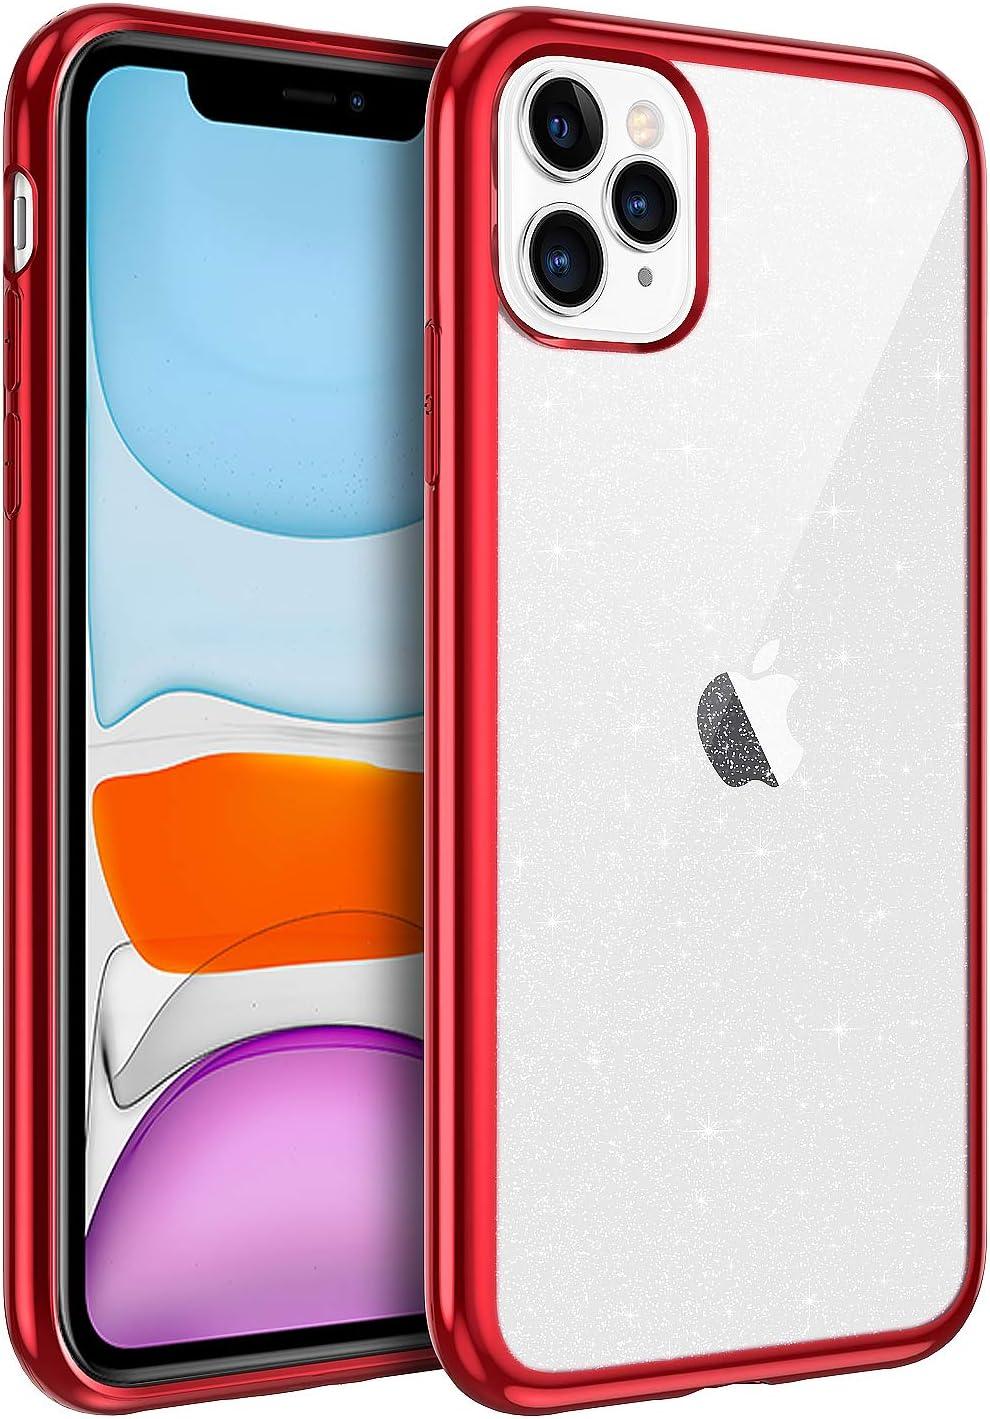 Bentoben Iphone 11 Pro Hülle Handyhülle Glitzer Iphone Elektronik